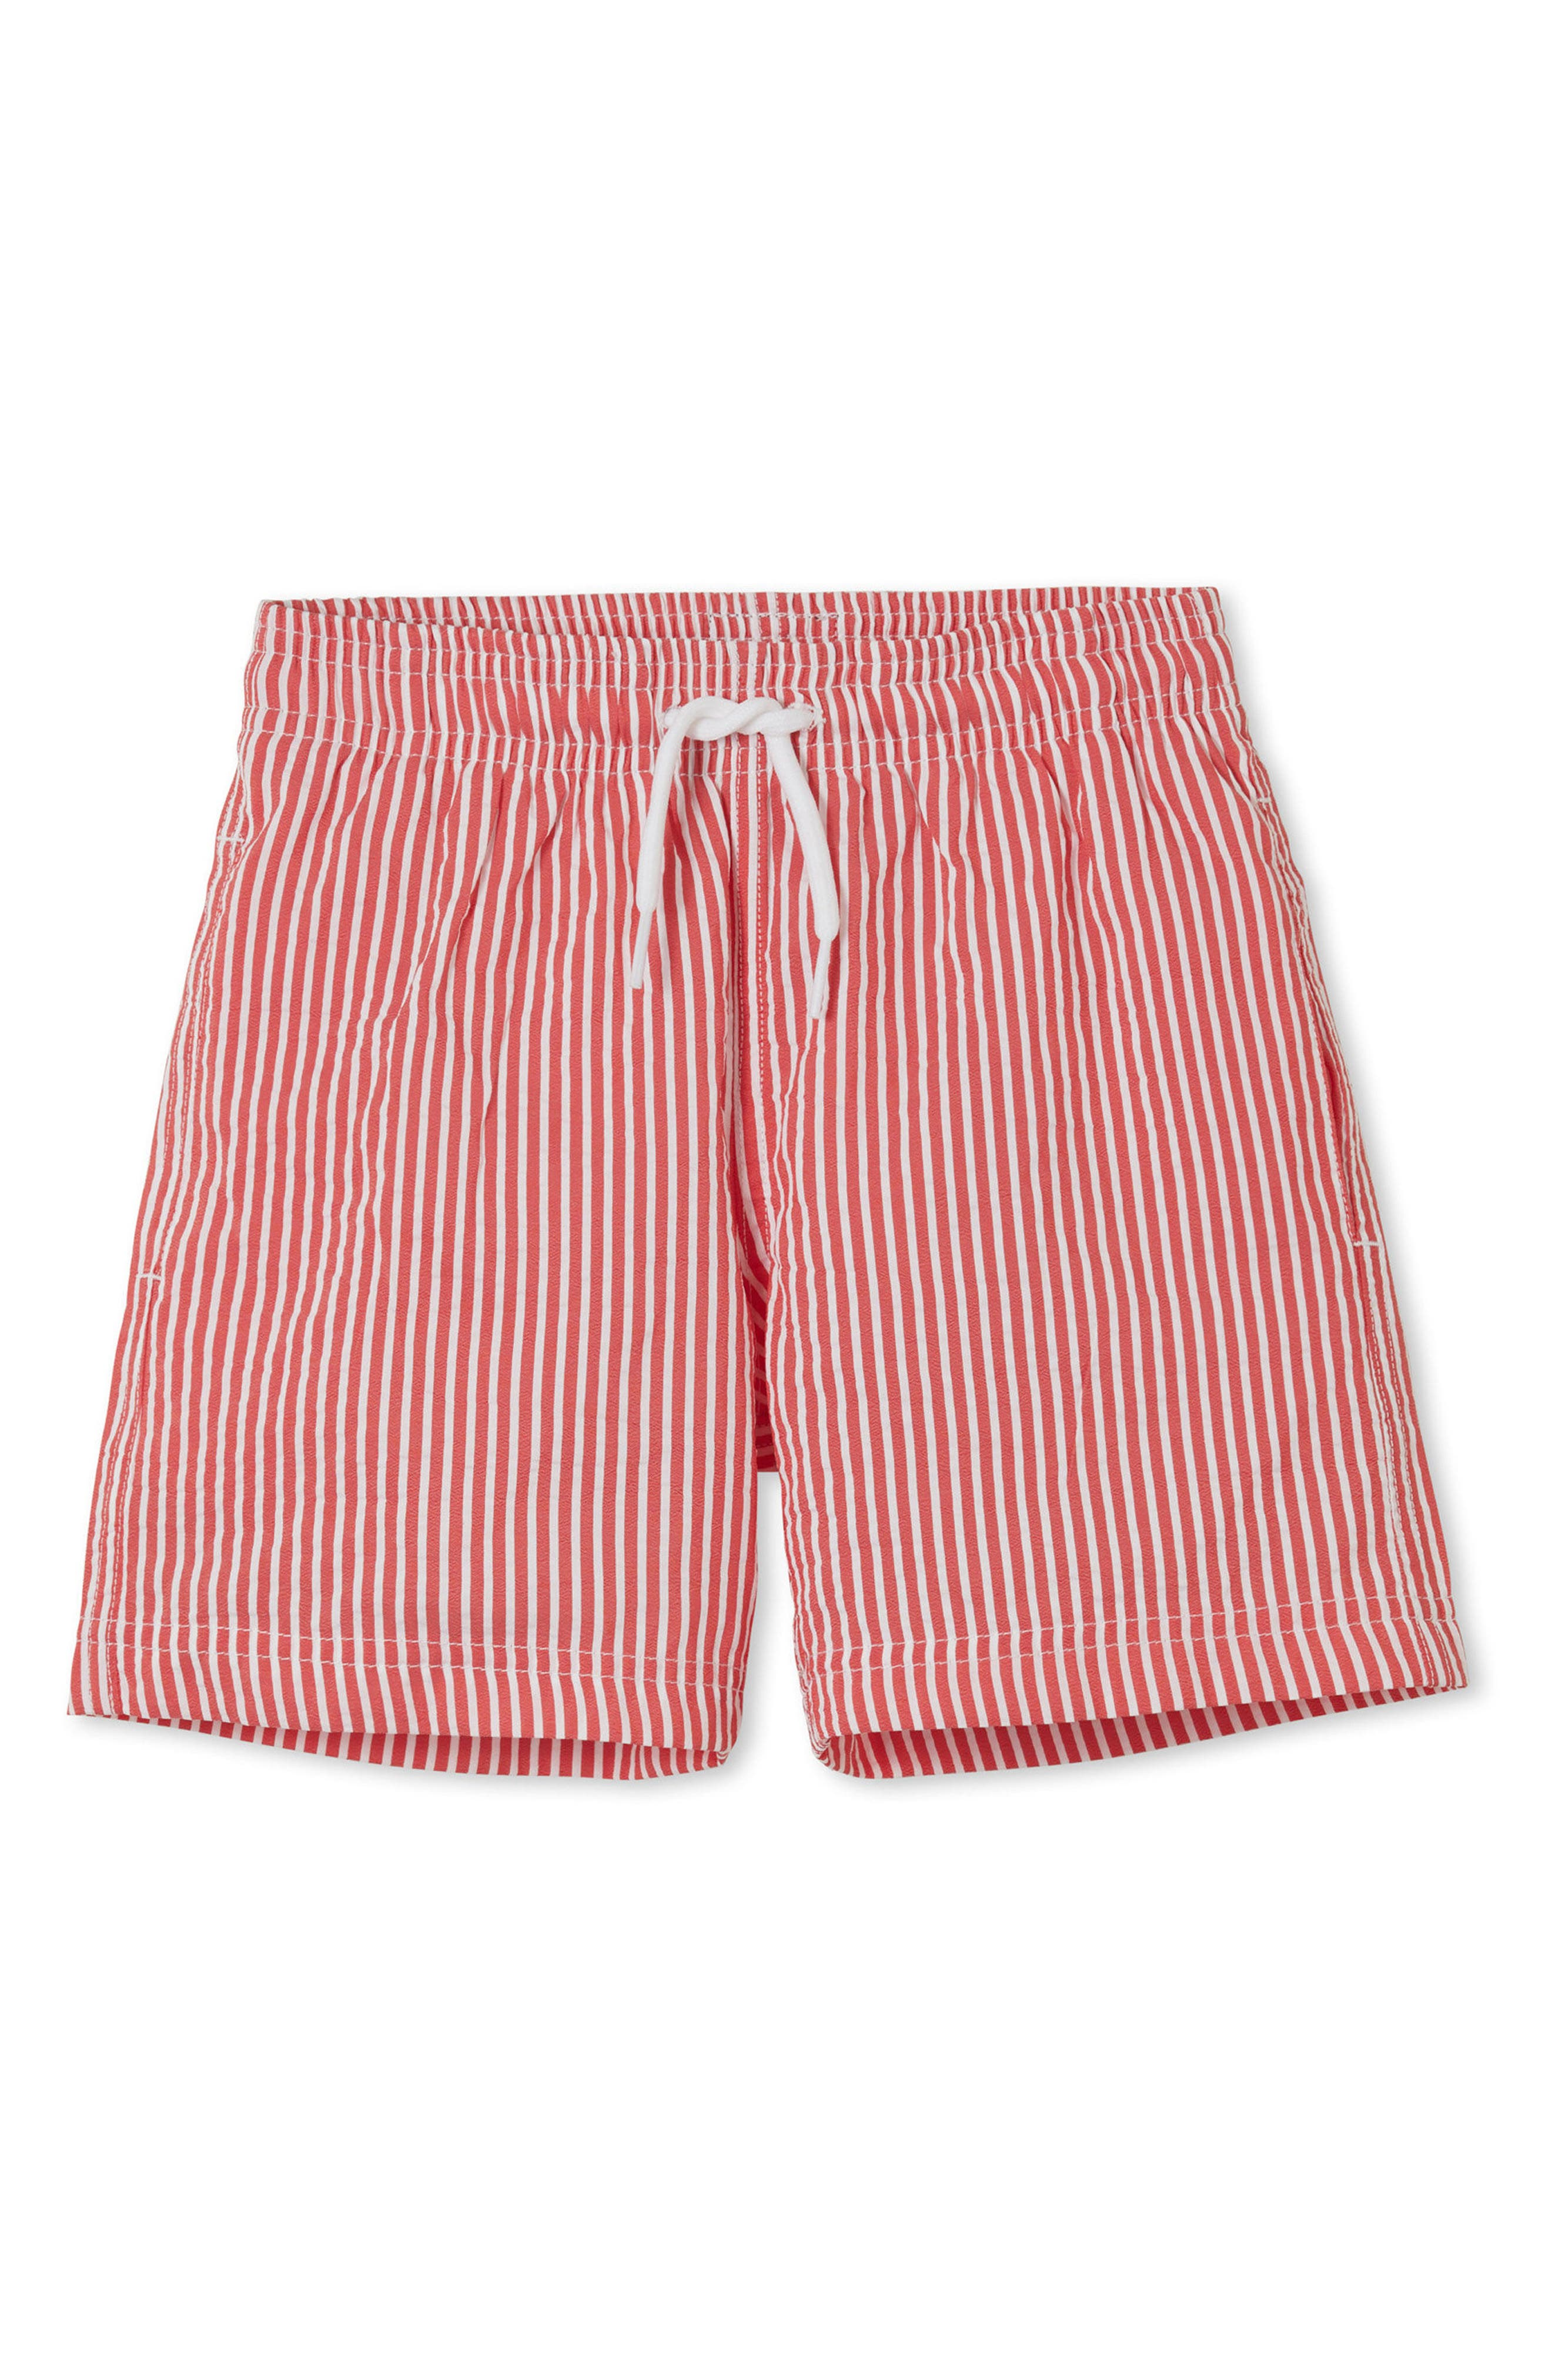 Red Stripe Swim Trunks,                         Main,                         color, Red